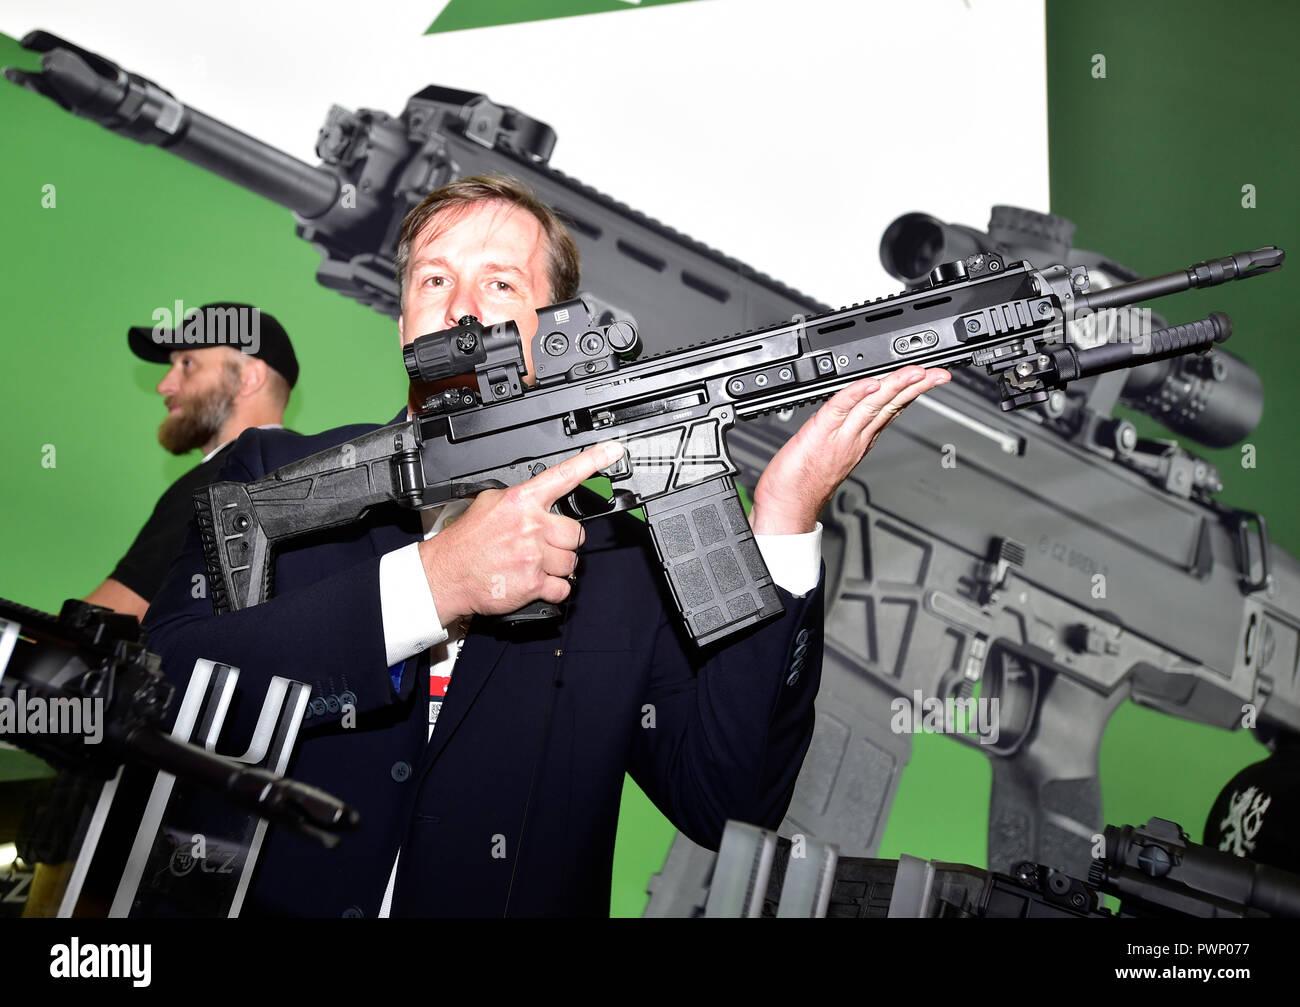 https://c8.alamy.com/comp/PWP077/prague-czech-republic-17th-oct-2018-presentation-of-new-version-of-a-cz-bren-2-assault-rifle-by-ceska-zbrojovka-czech-firearms-manufacturer-during-the-future-forces-forum-2018-fair-in-prague-czech-republic-on-october-17-2018-credit-roman-vondrousctk-photoalamy-live-news-PWP077.jpg